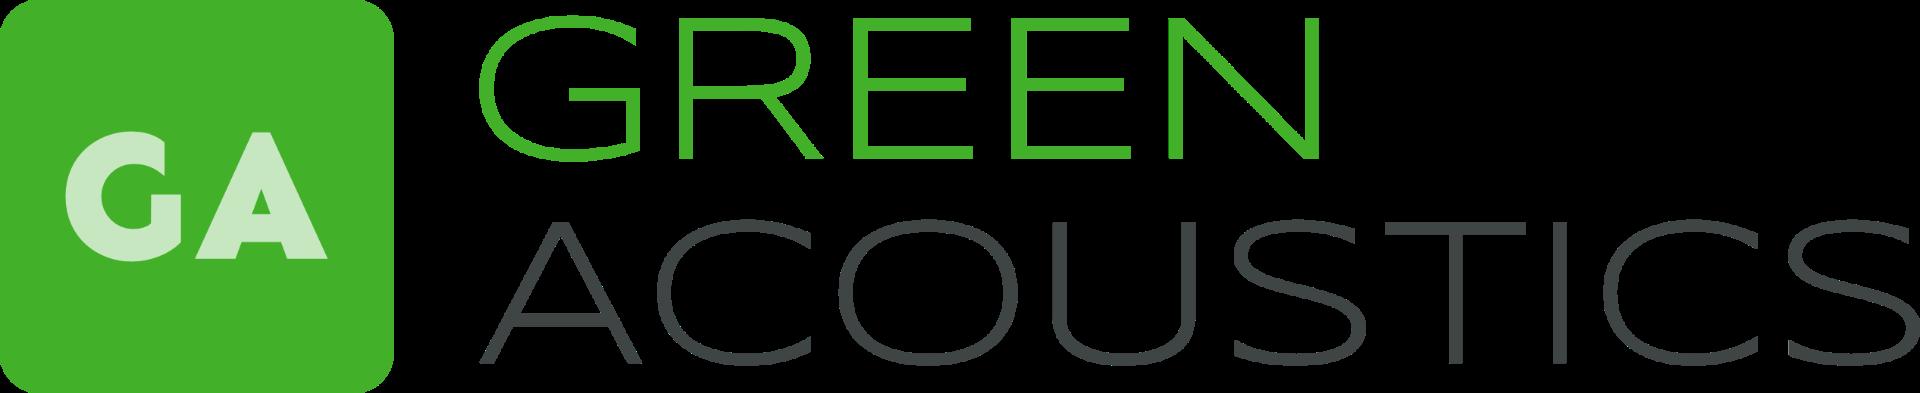 green acoustic- panele akustyczne z mchu